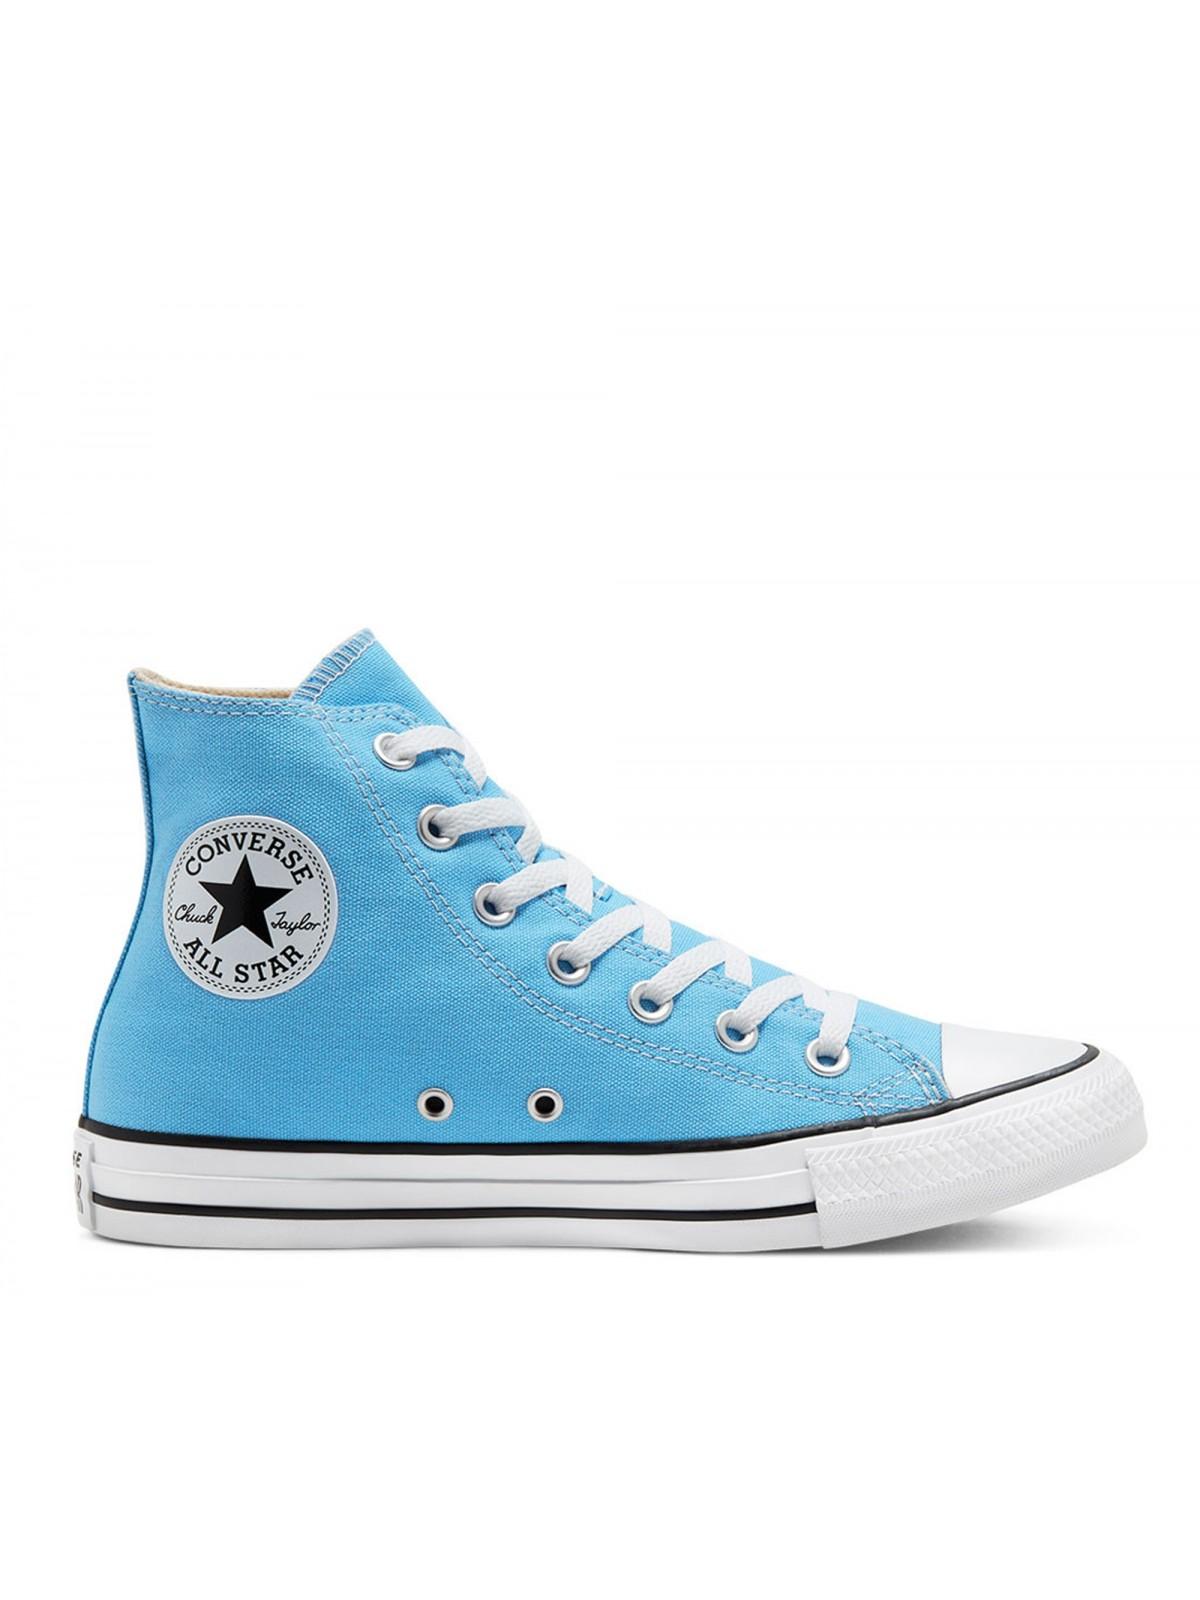 Converse Chuck Taylor all star bleu littoral Converse